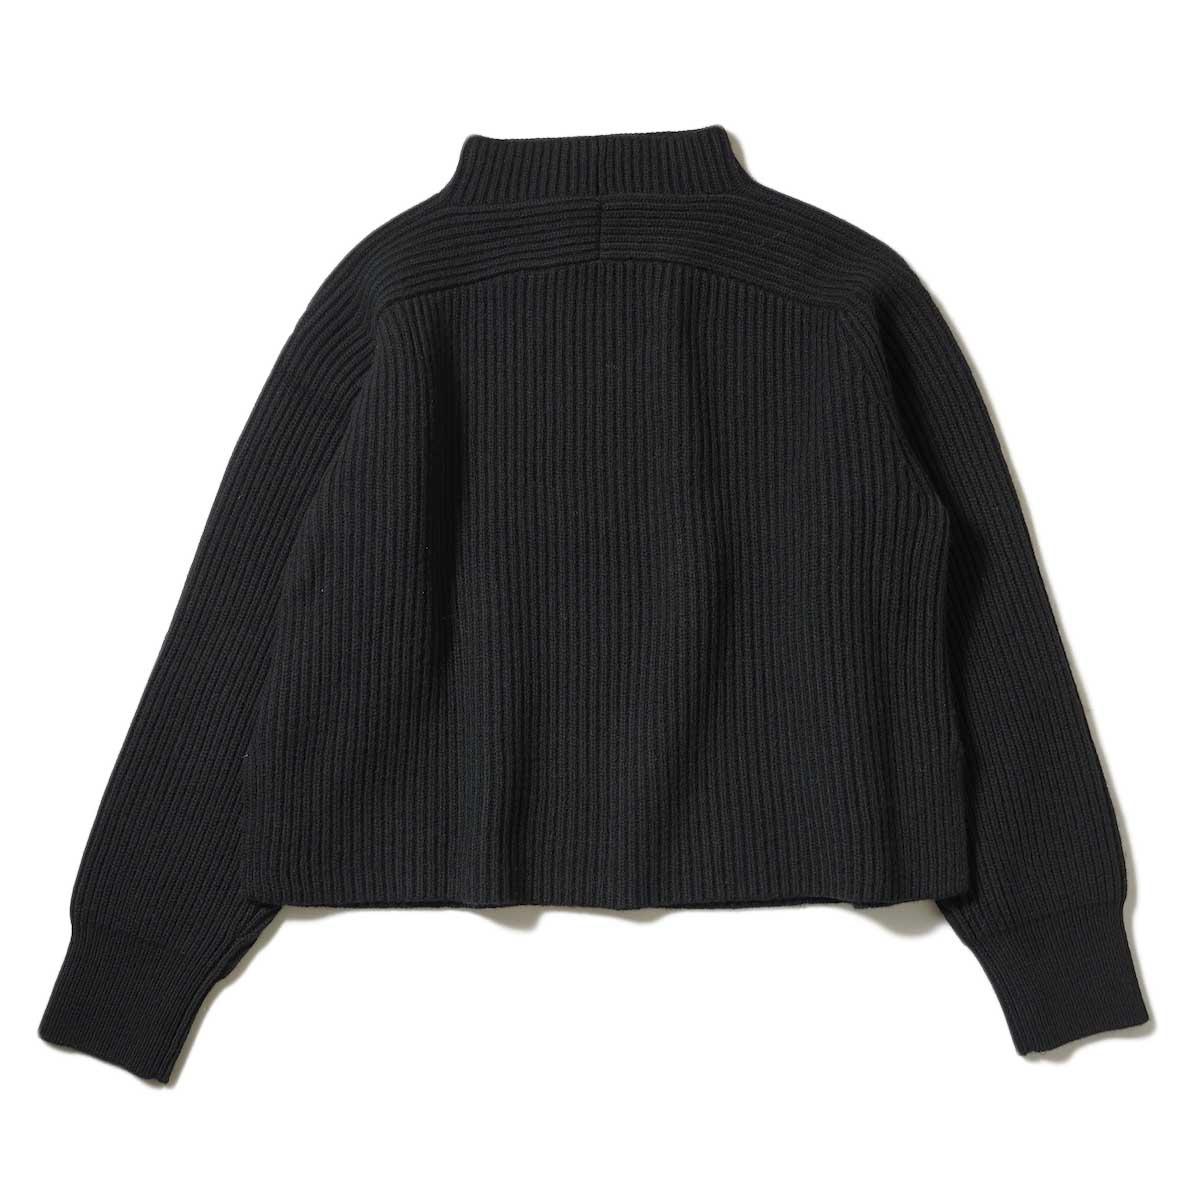 YLEVE / EX FINE MERINOWOOL KN P/O (Black) 背面